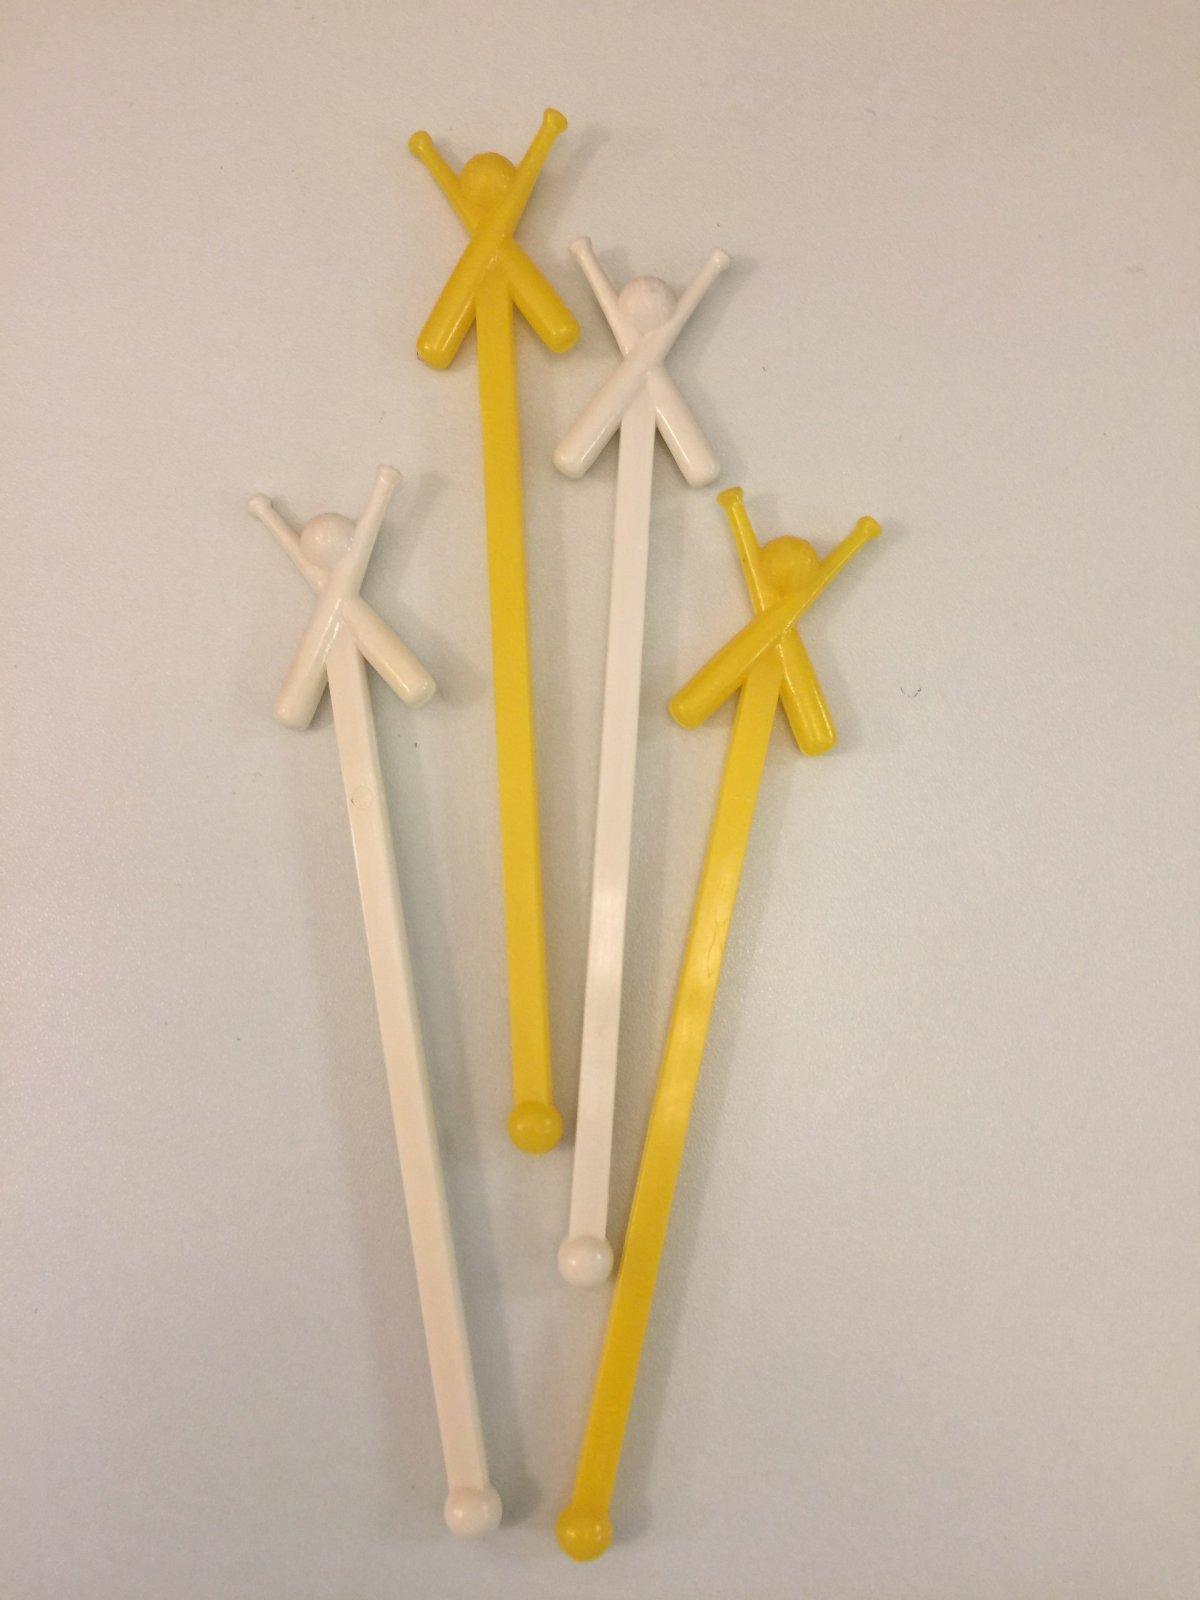 Baseball Stir/Sucker Sticks 14ct